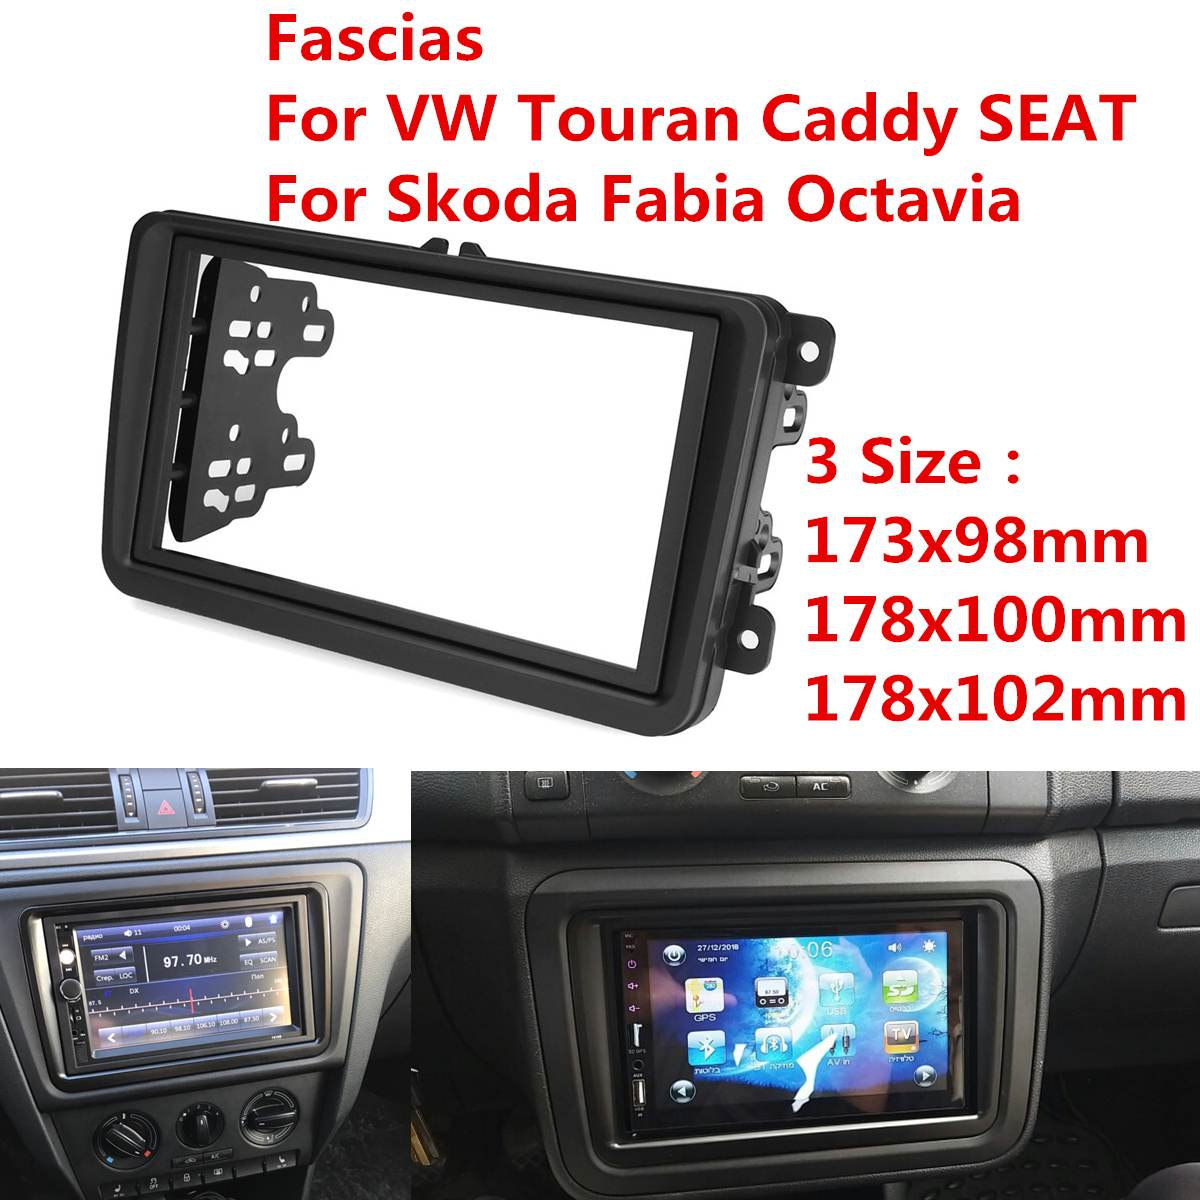 2 Din Car Radio Fascia Fascias Panel Frame CD DVD Dash Audio Interior for Volkswagen VW Touran Caddy SEAT Skoda Fabia Octavia